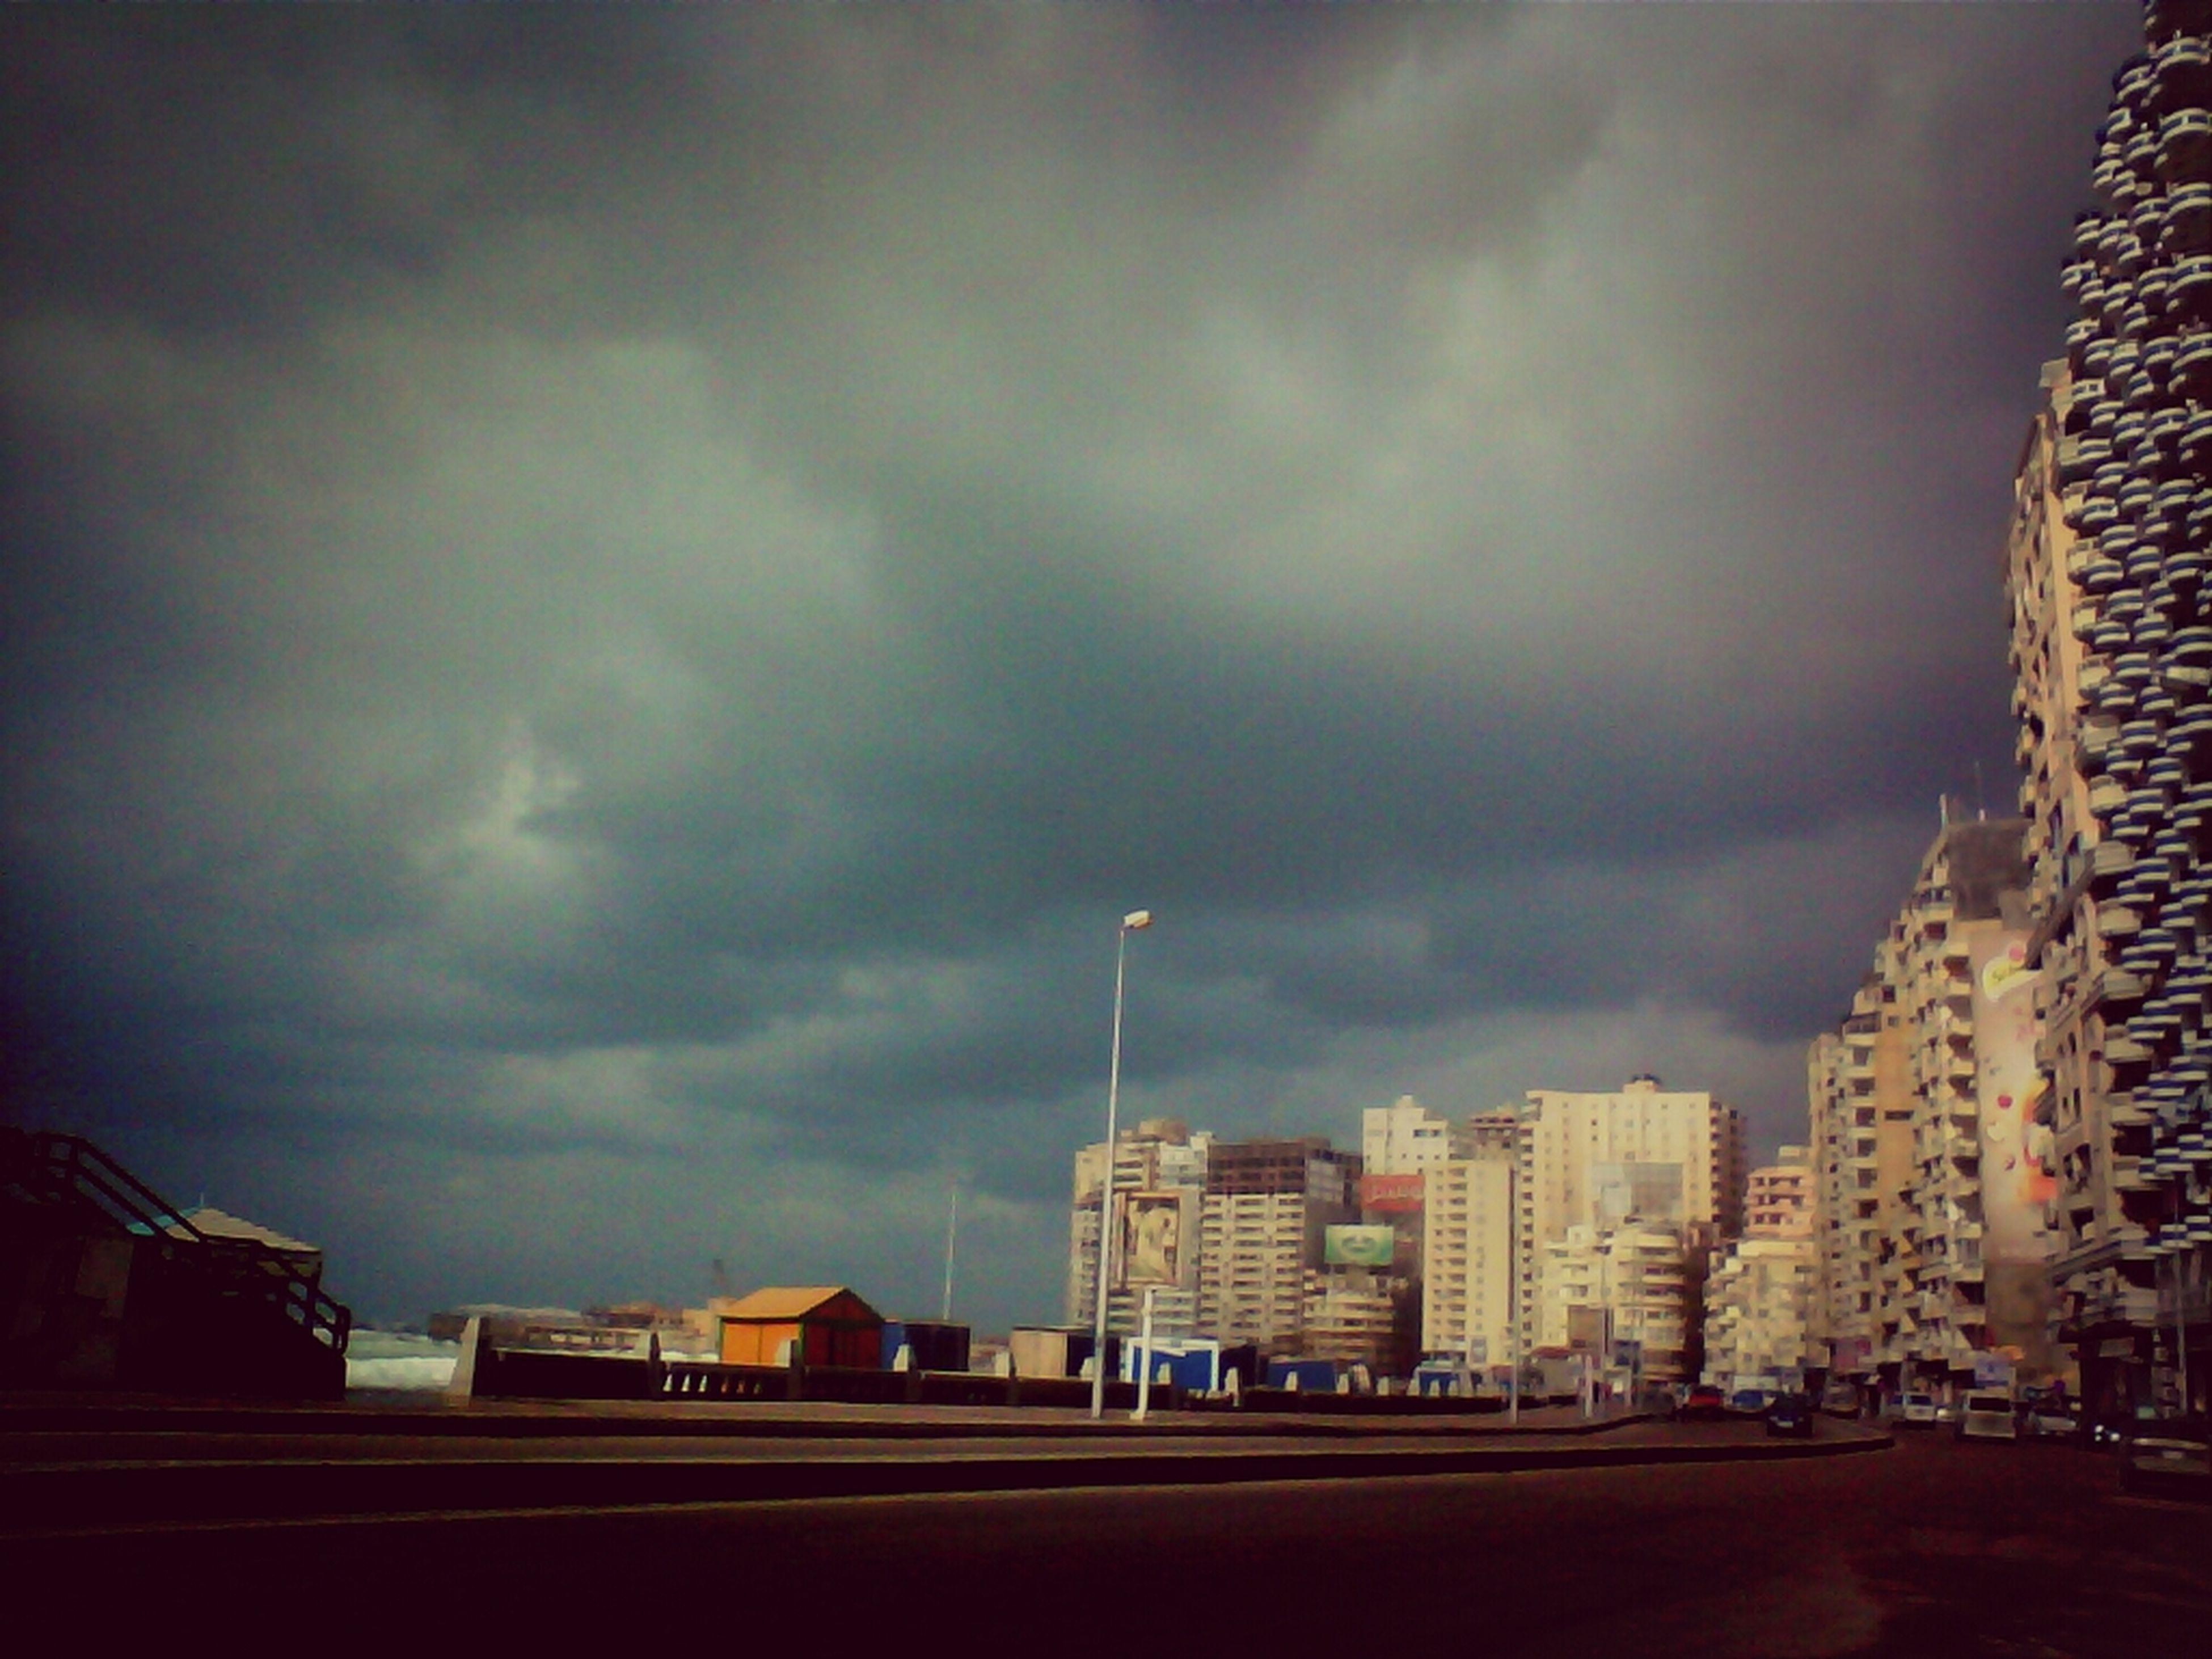 building exterior, architecture, built structure, sky, cloud - sky, cloudy, city, overcast, storm cloud, weather, residential building, building, dusk, cloud, cityscape, residential structure, street, residential district, outdoors, city life